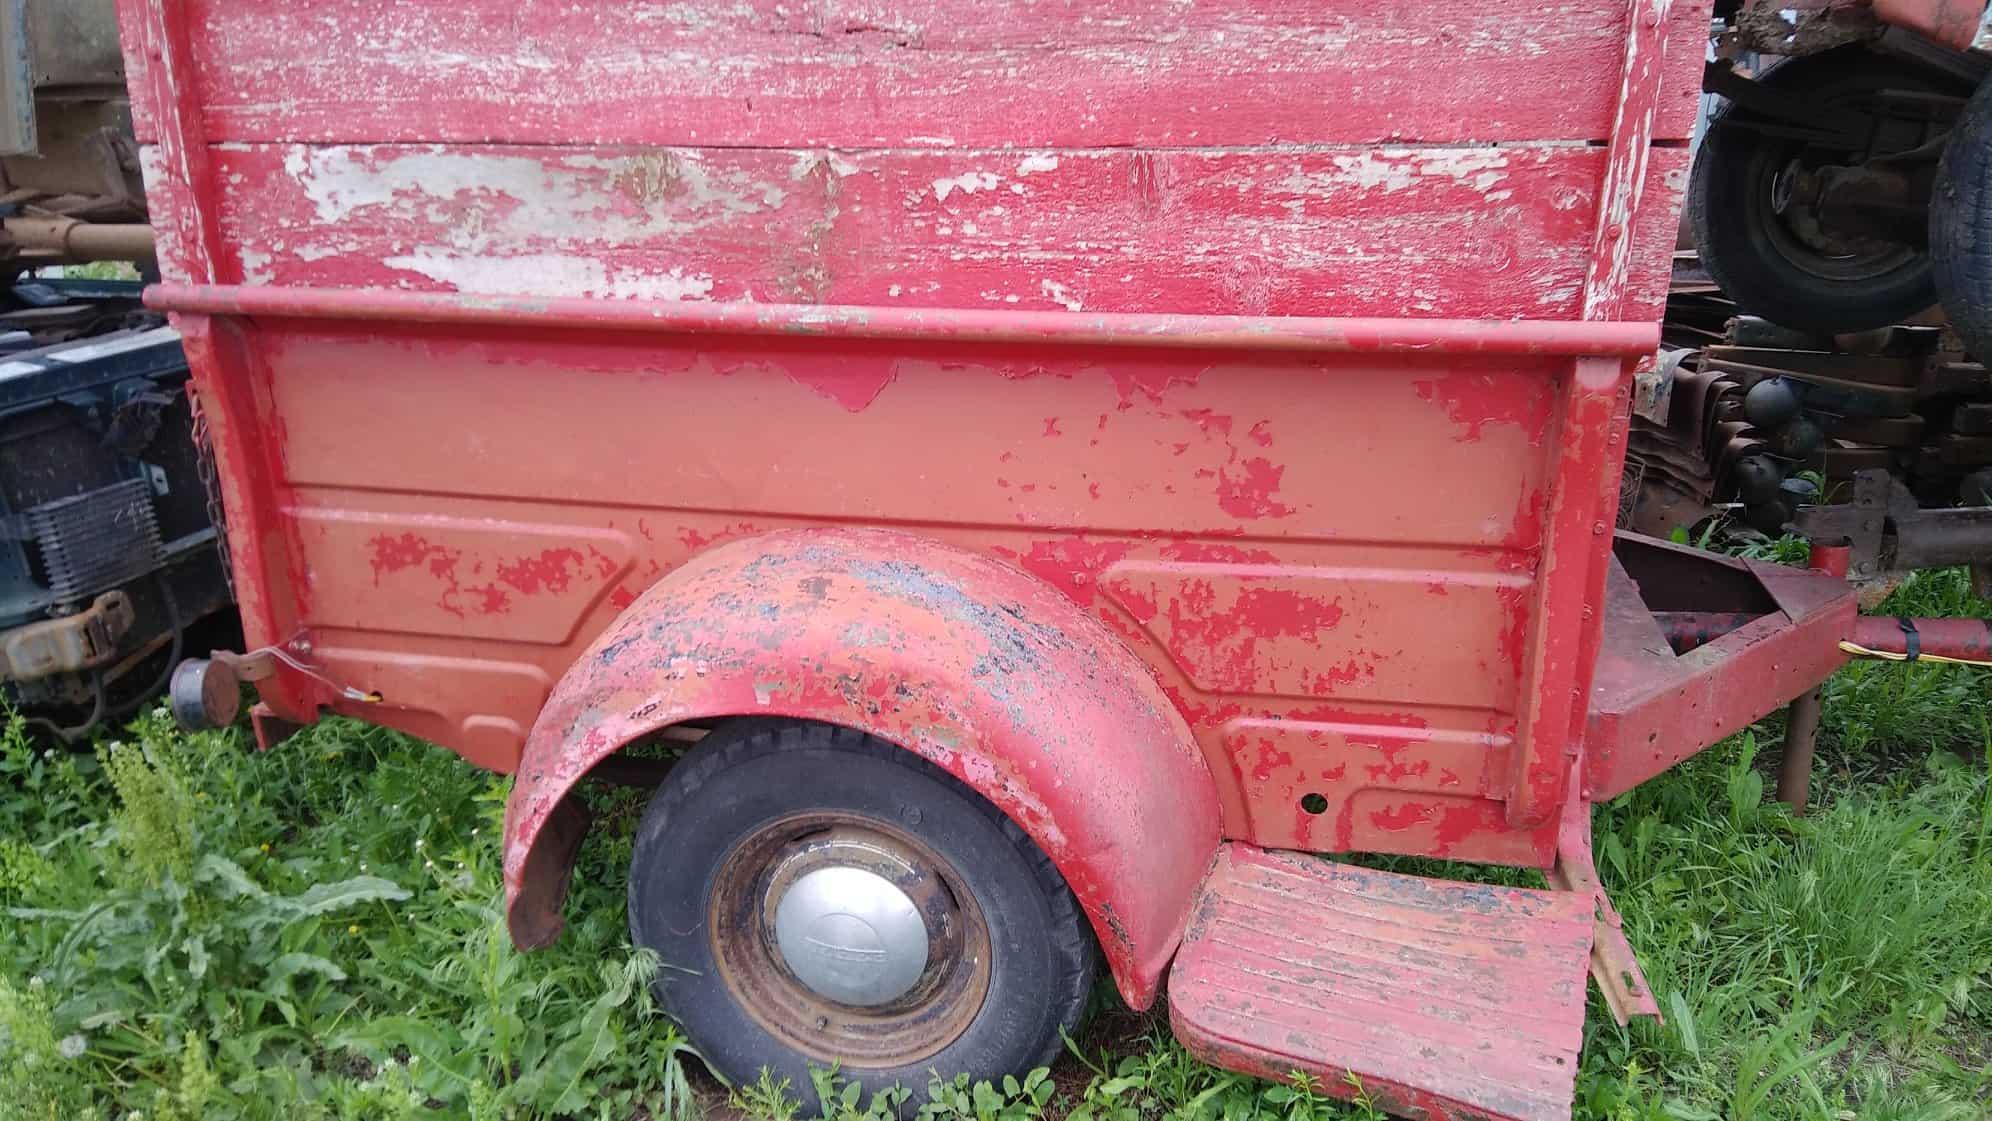 Classic Truck Beds For Sale in Harvard, Nebraska -01